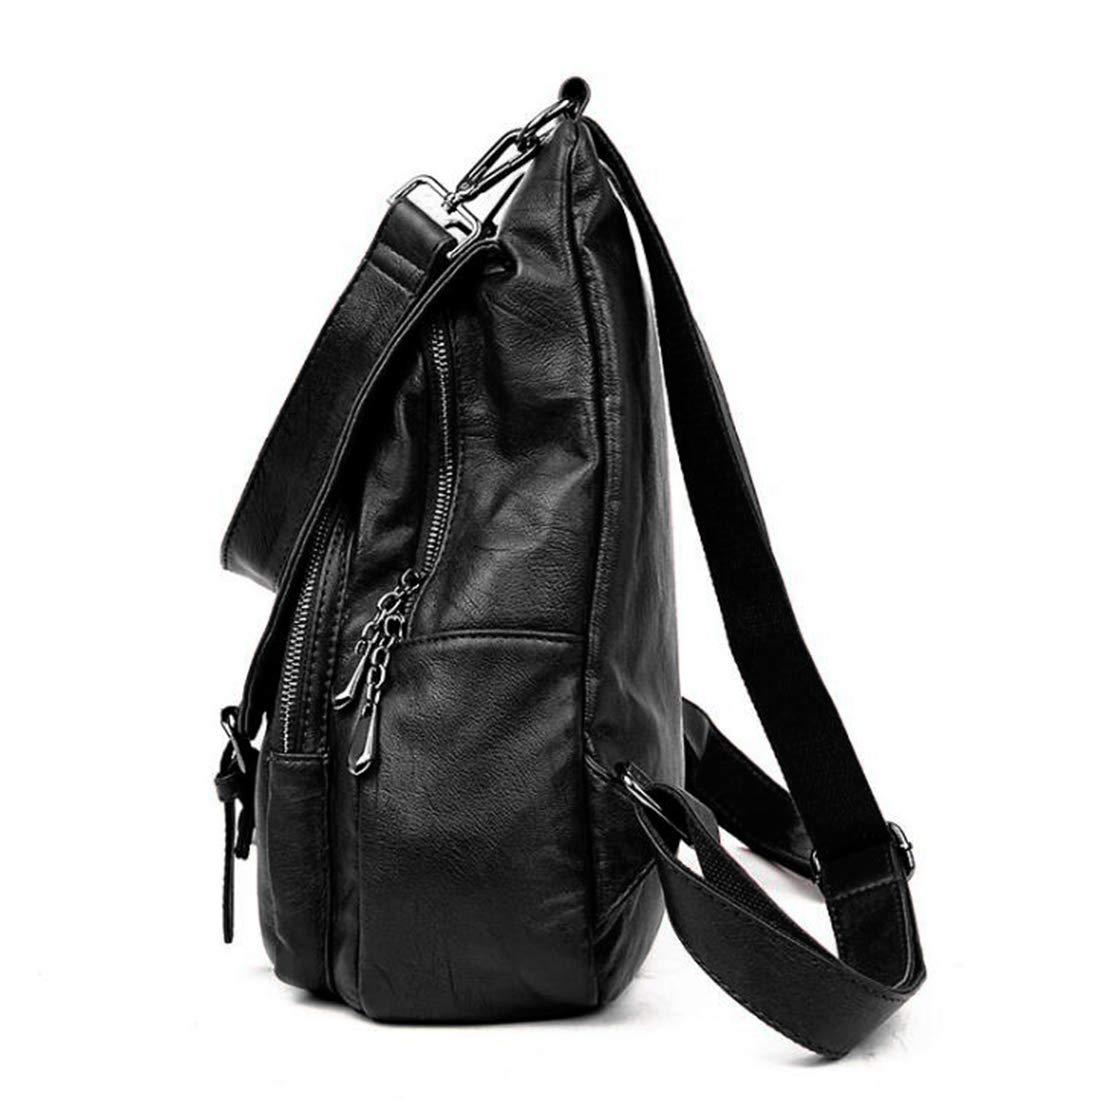 b97c7d5fec9dde Fashion Mode Damen Rucksack PU Leder Damentasche Schultertasche Handbag  Rucksäcke Frauen Rucksack 2 in 1 Damen ...